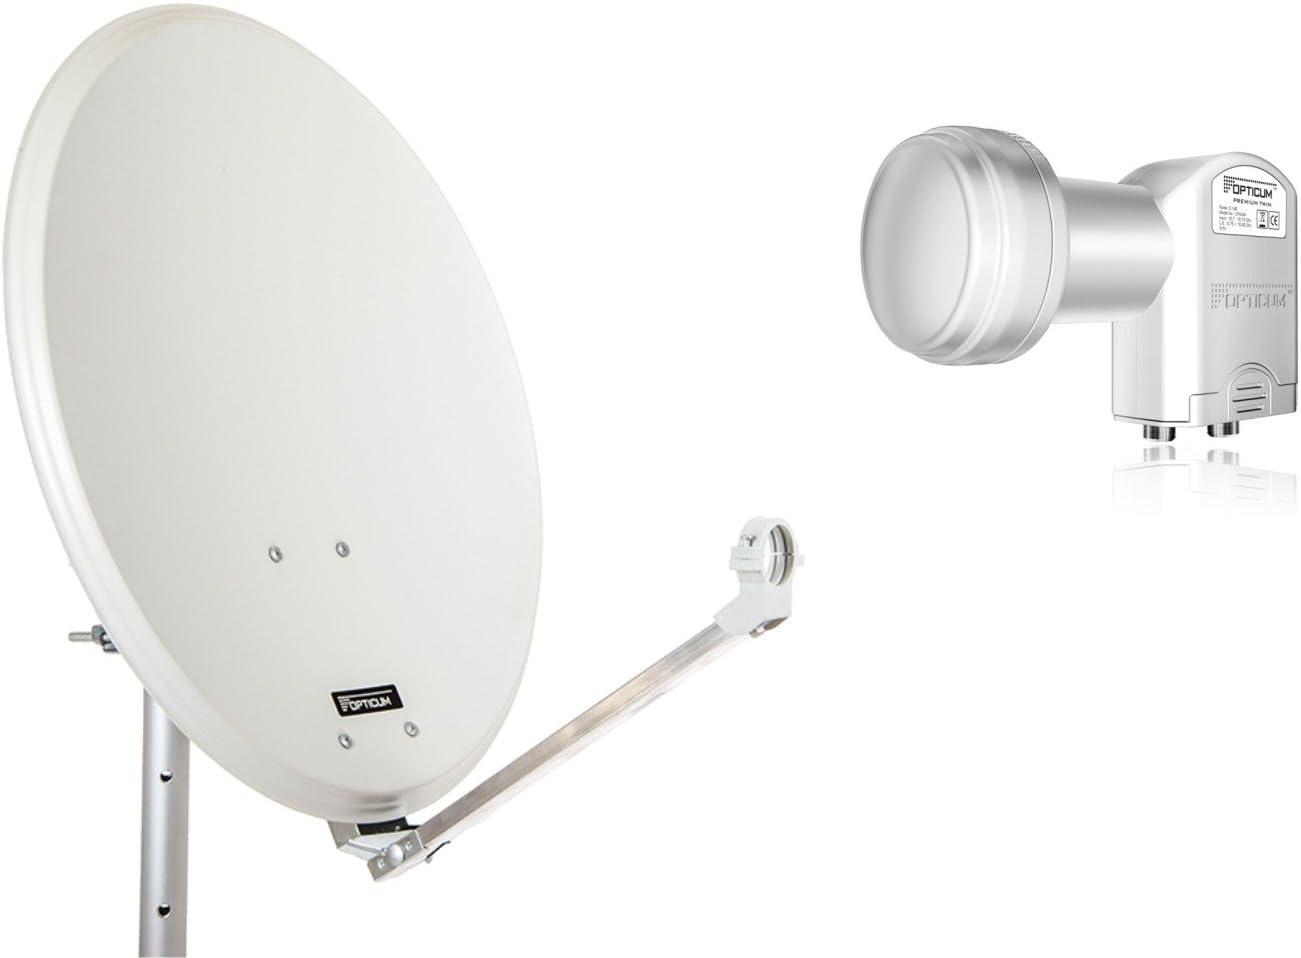 Opticum Stahl QA60 - Antena parabólica con LNB Dual, 60 cm de Color Verde Claro